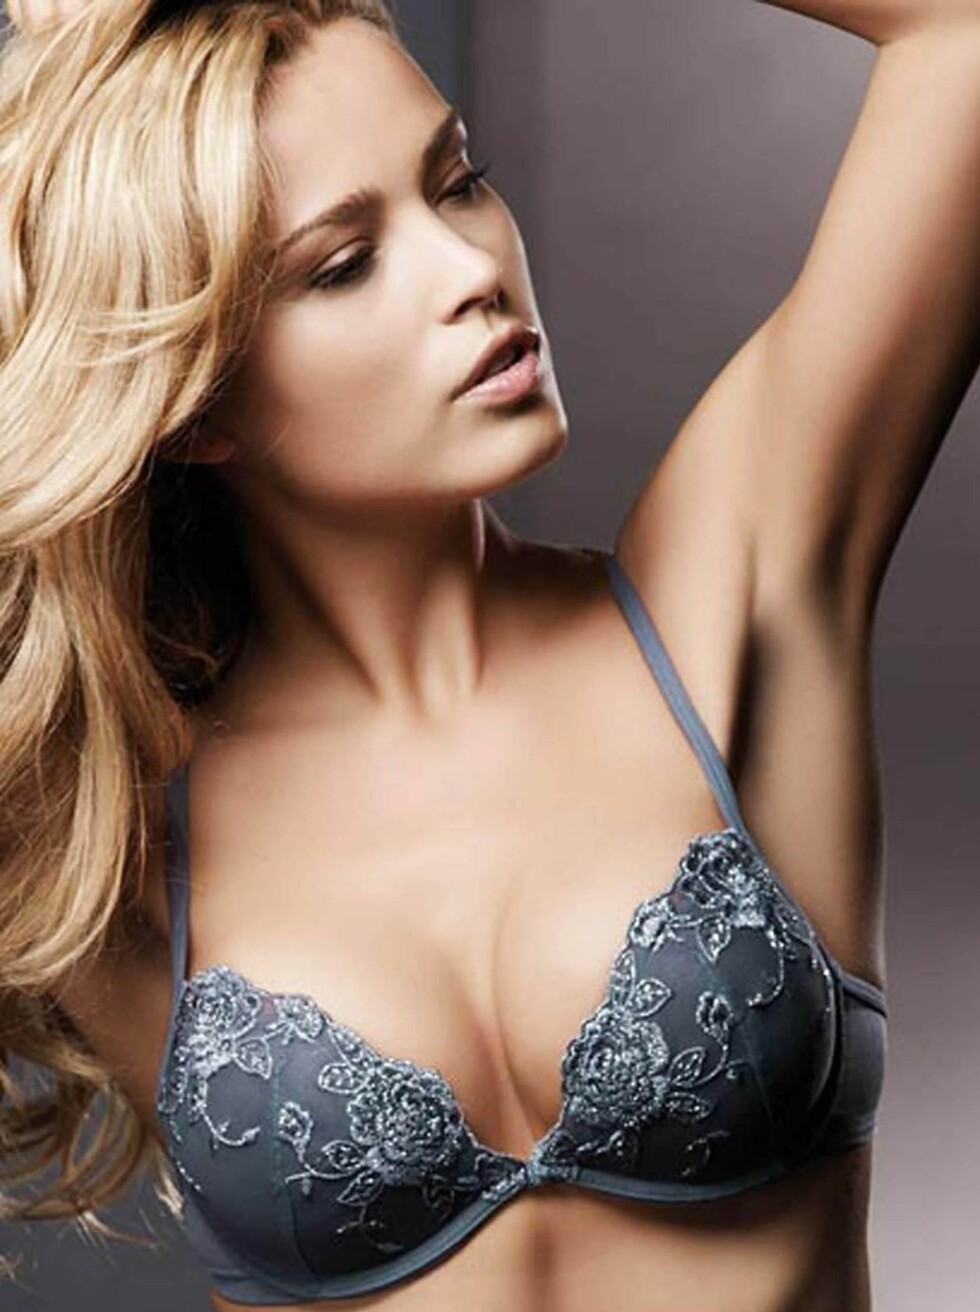 FLOTT: Supermodellen Petra Nemcova i brennhet reklame for undertøysfirmaet La Senza. Foto: All Over Press